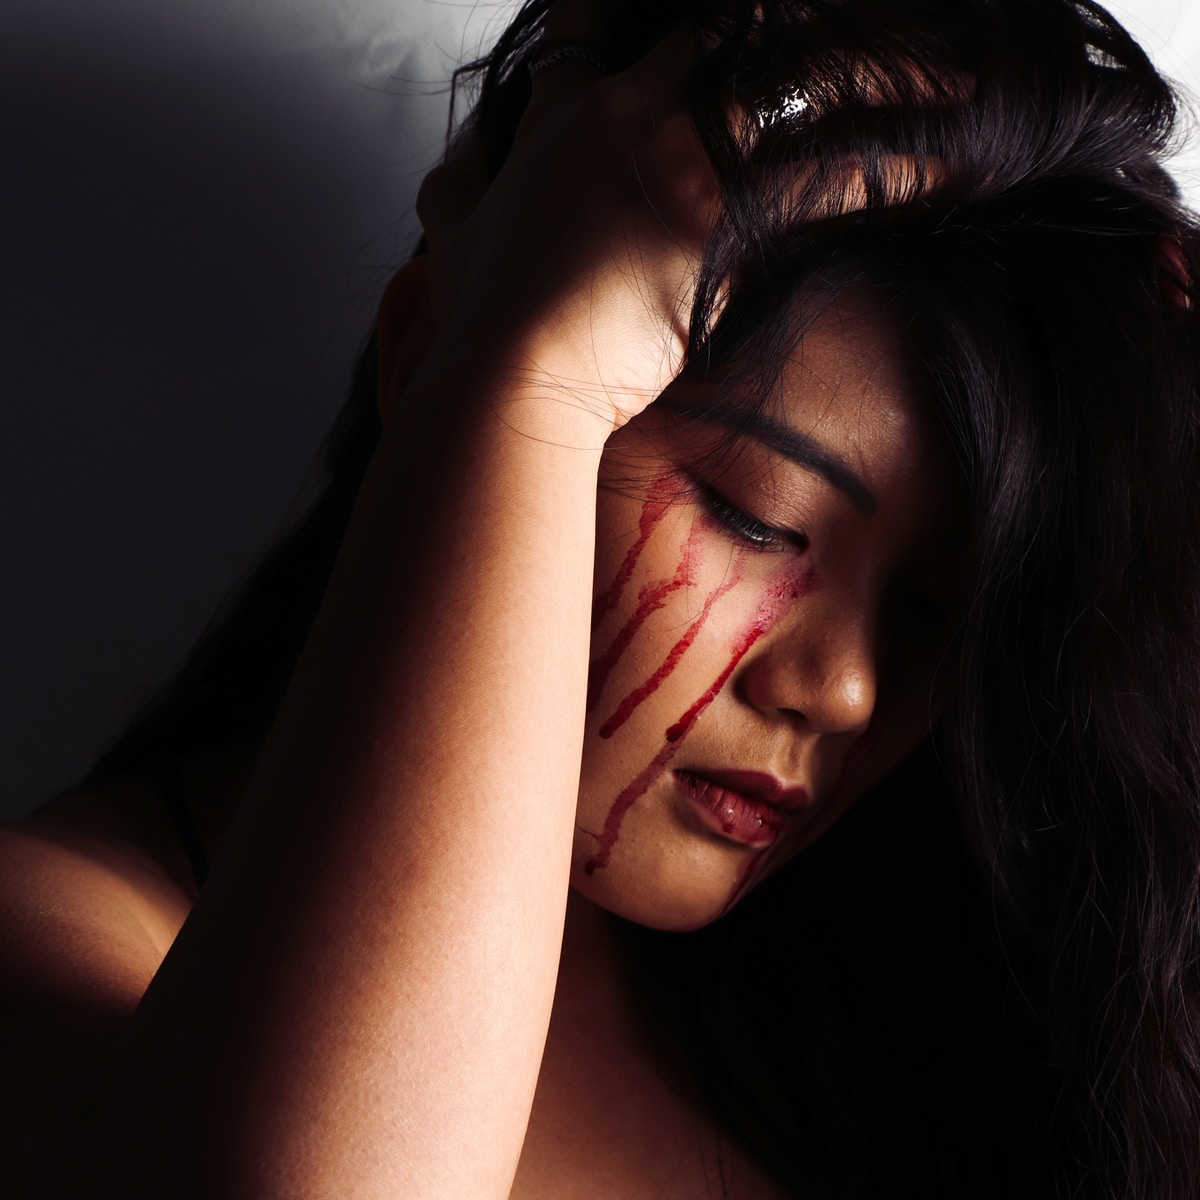 lágrimas de sangre, woman wearing red lipstick